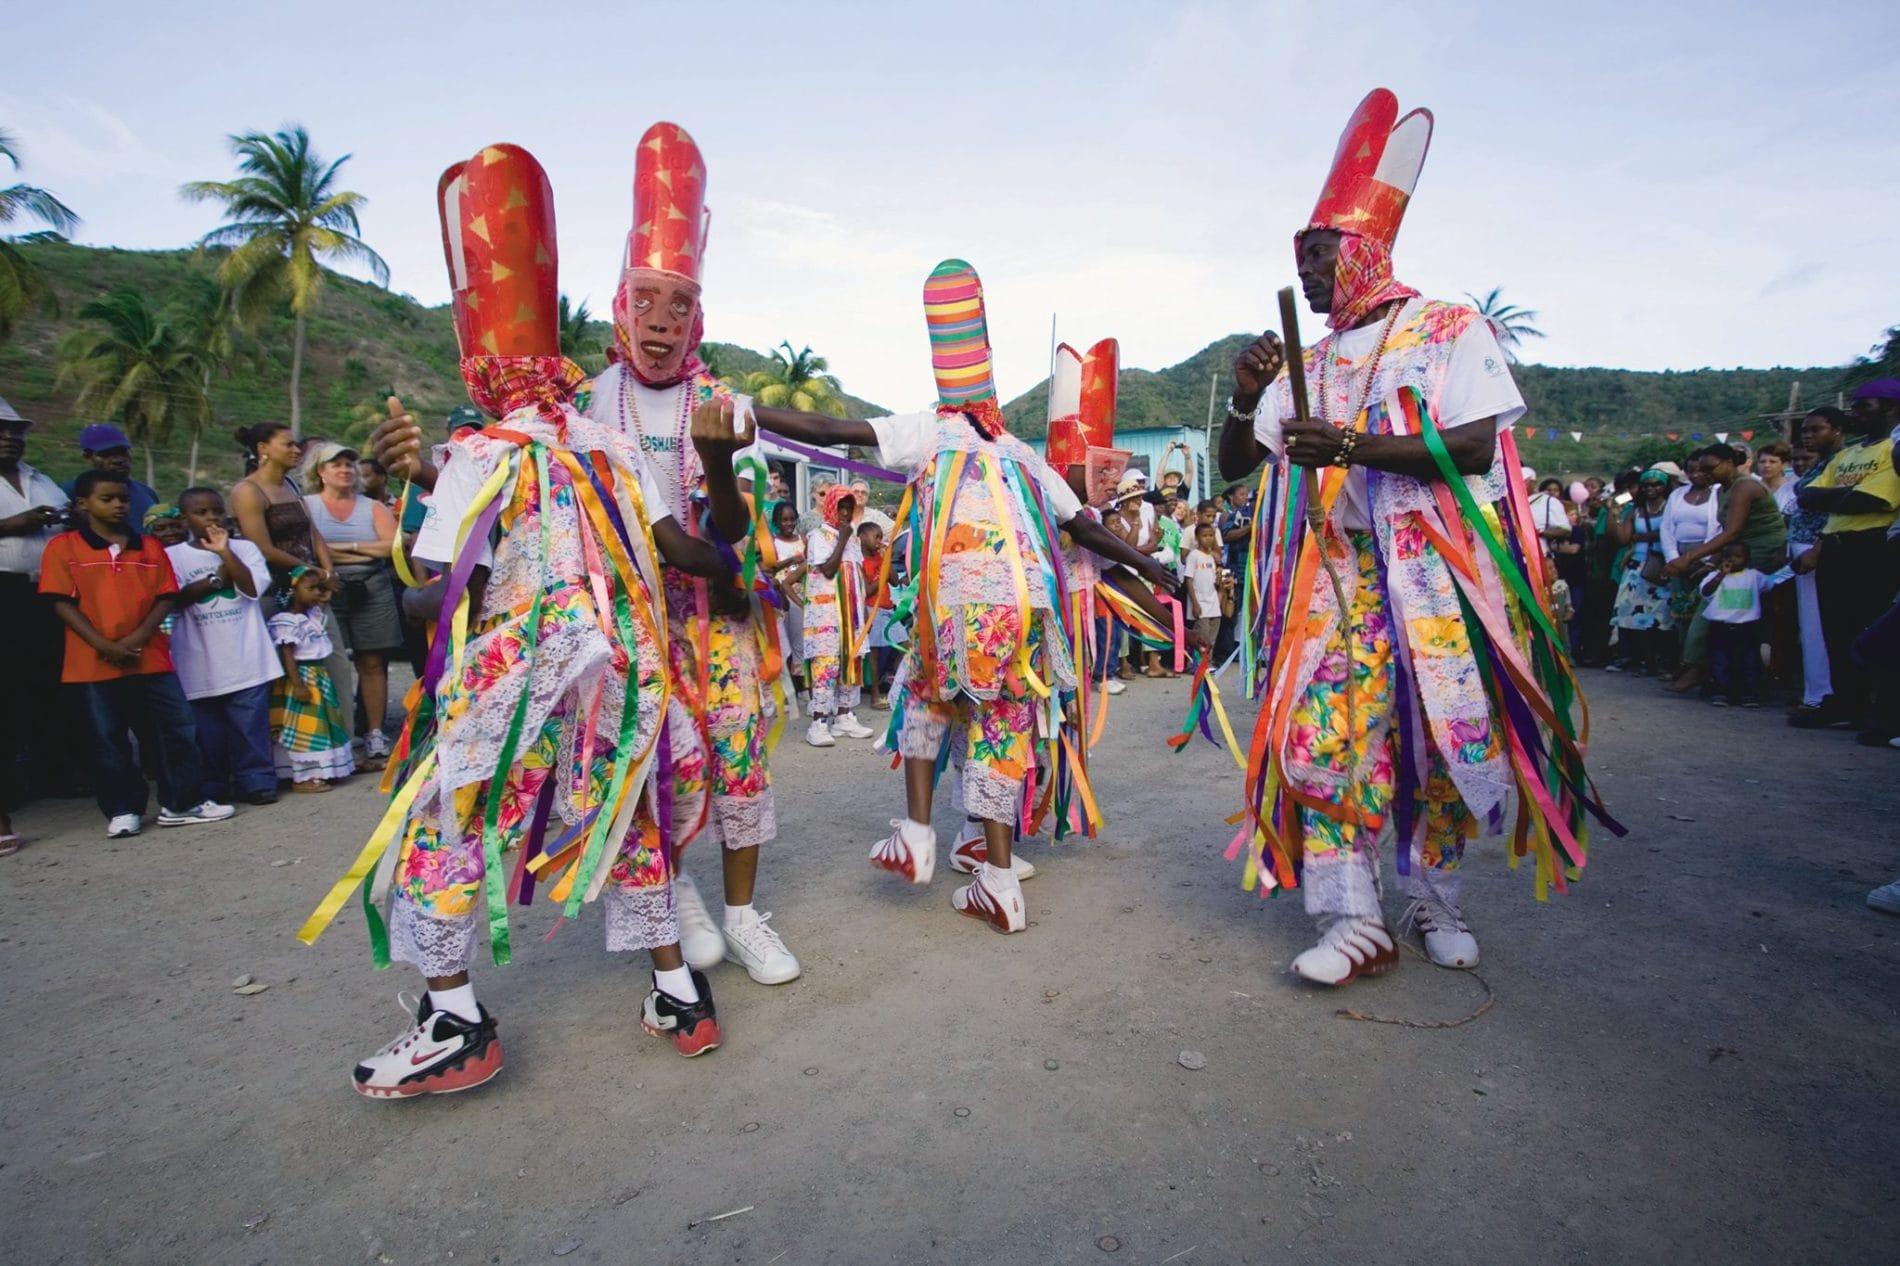 St Patricks Day on Montserrat